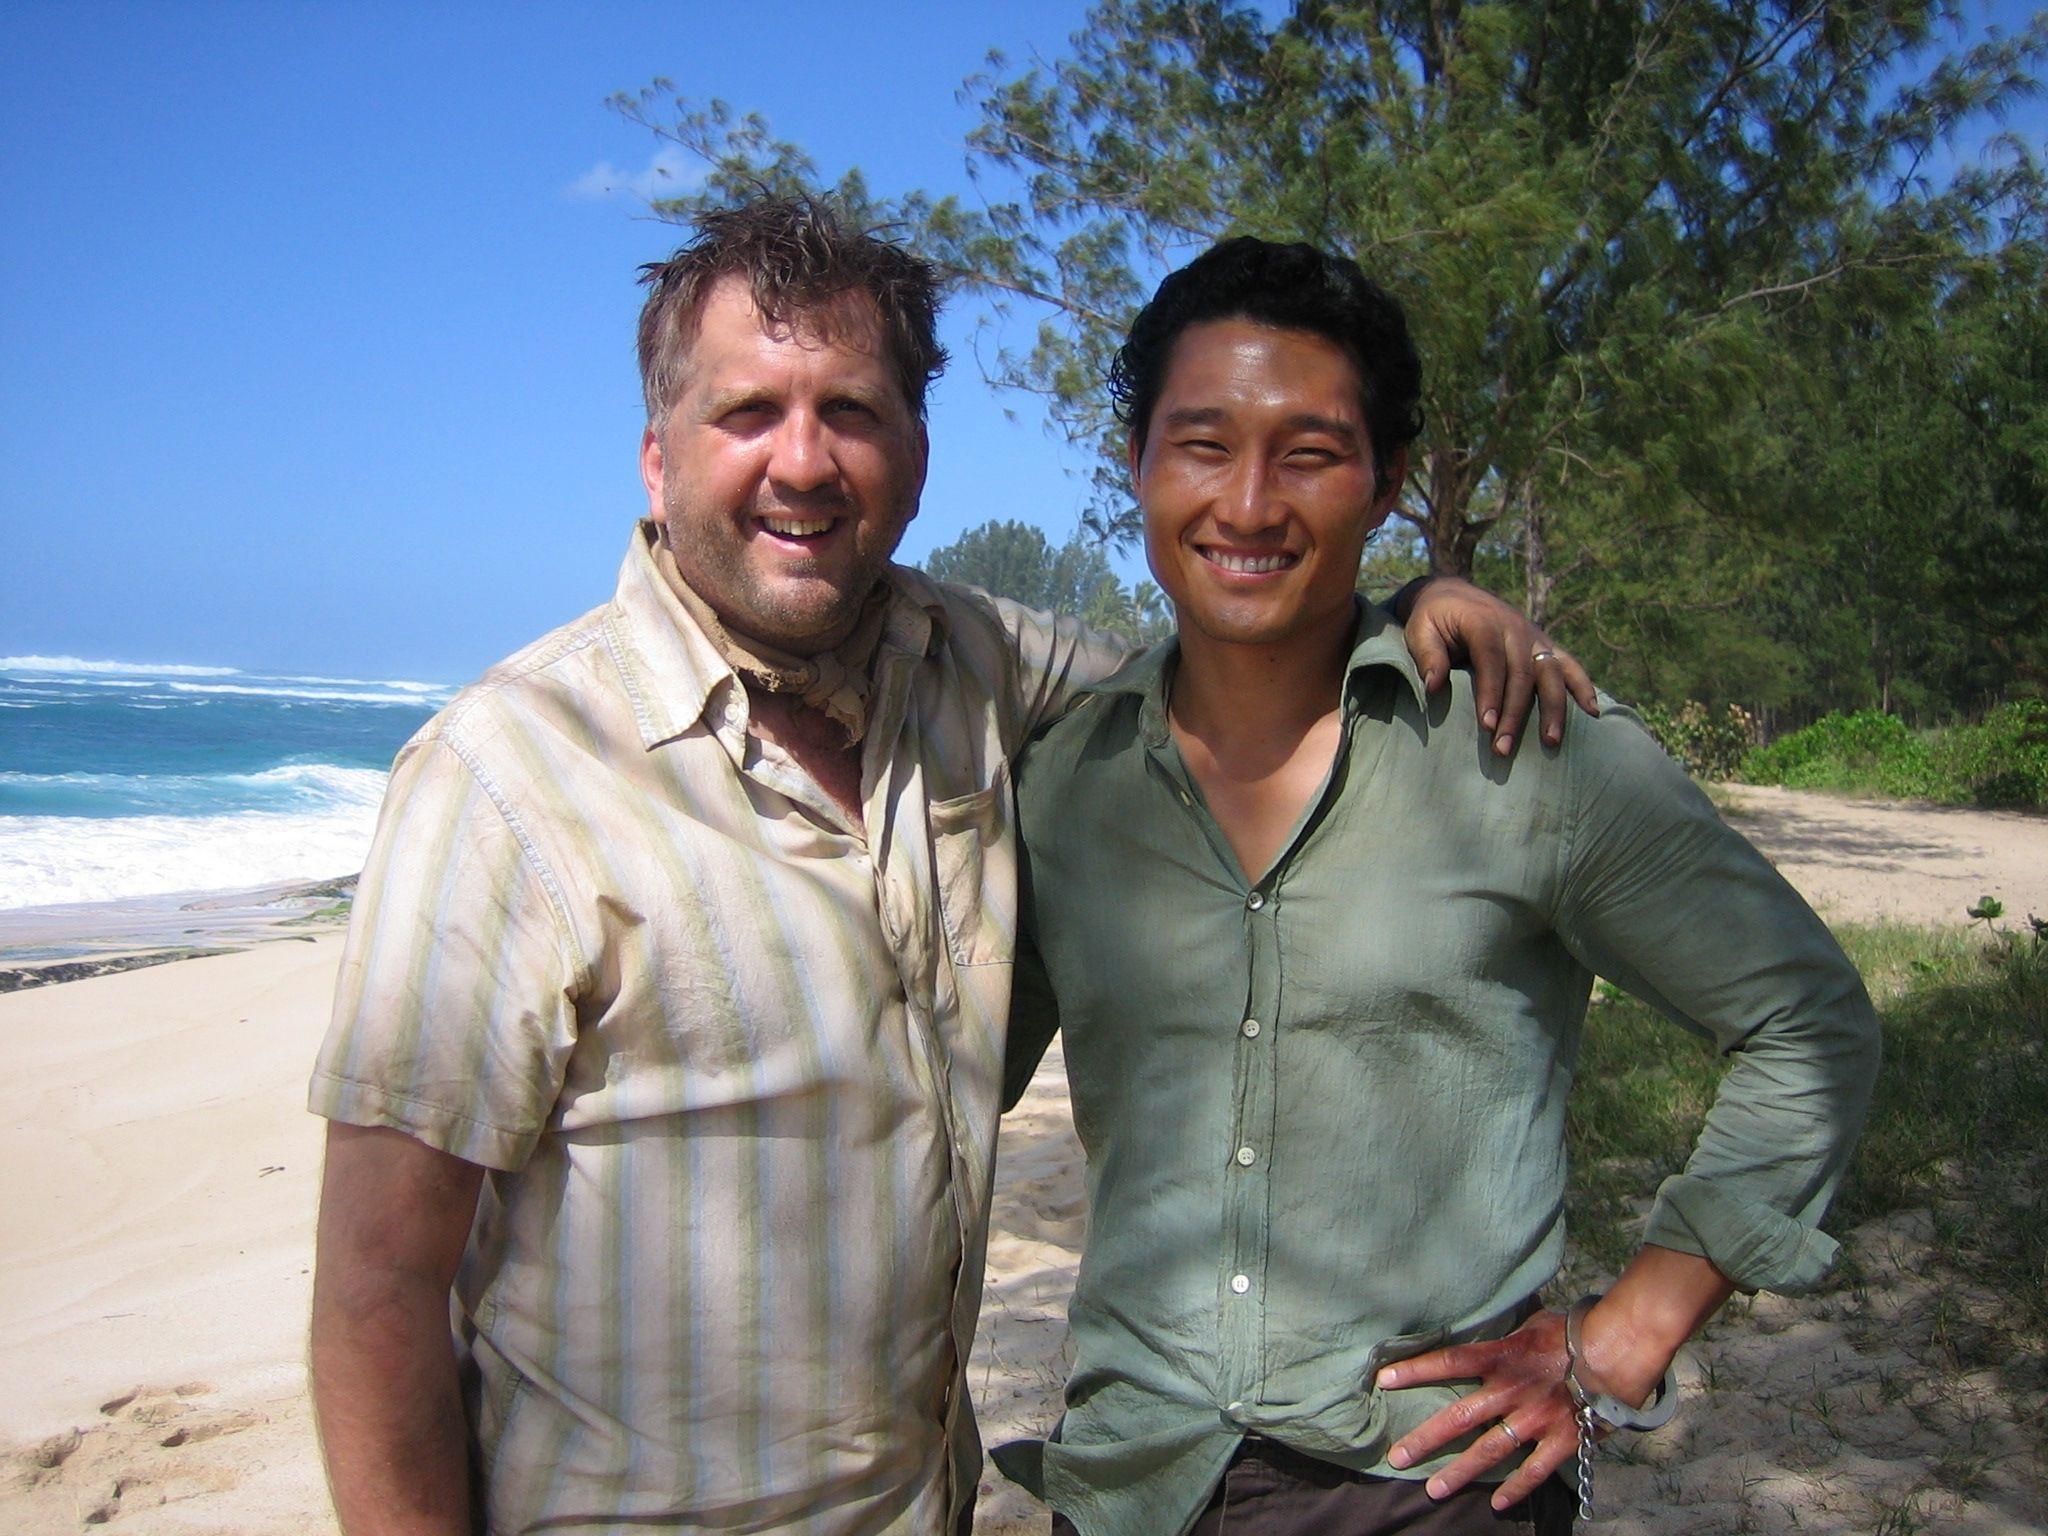 Daniel Roebuck and Daniel Dae Kim behind the scenes. What a great shot!